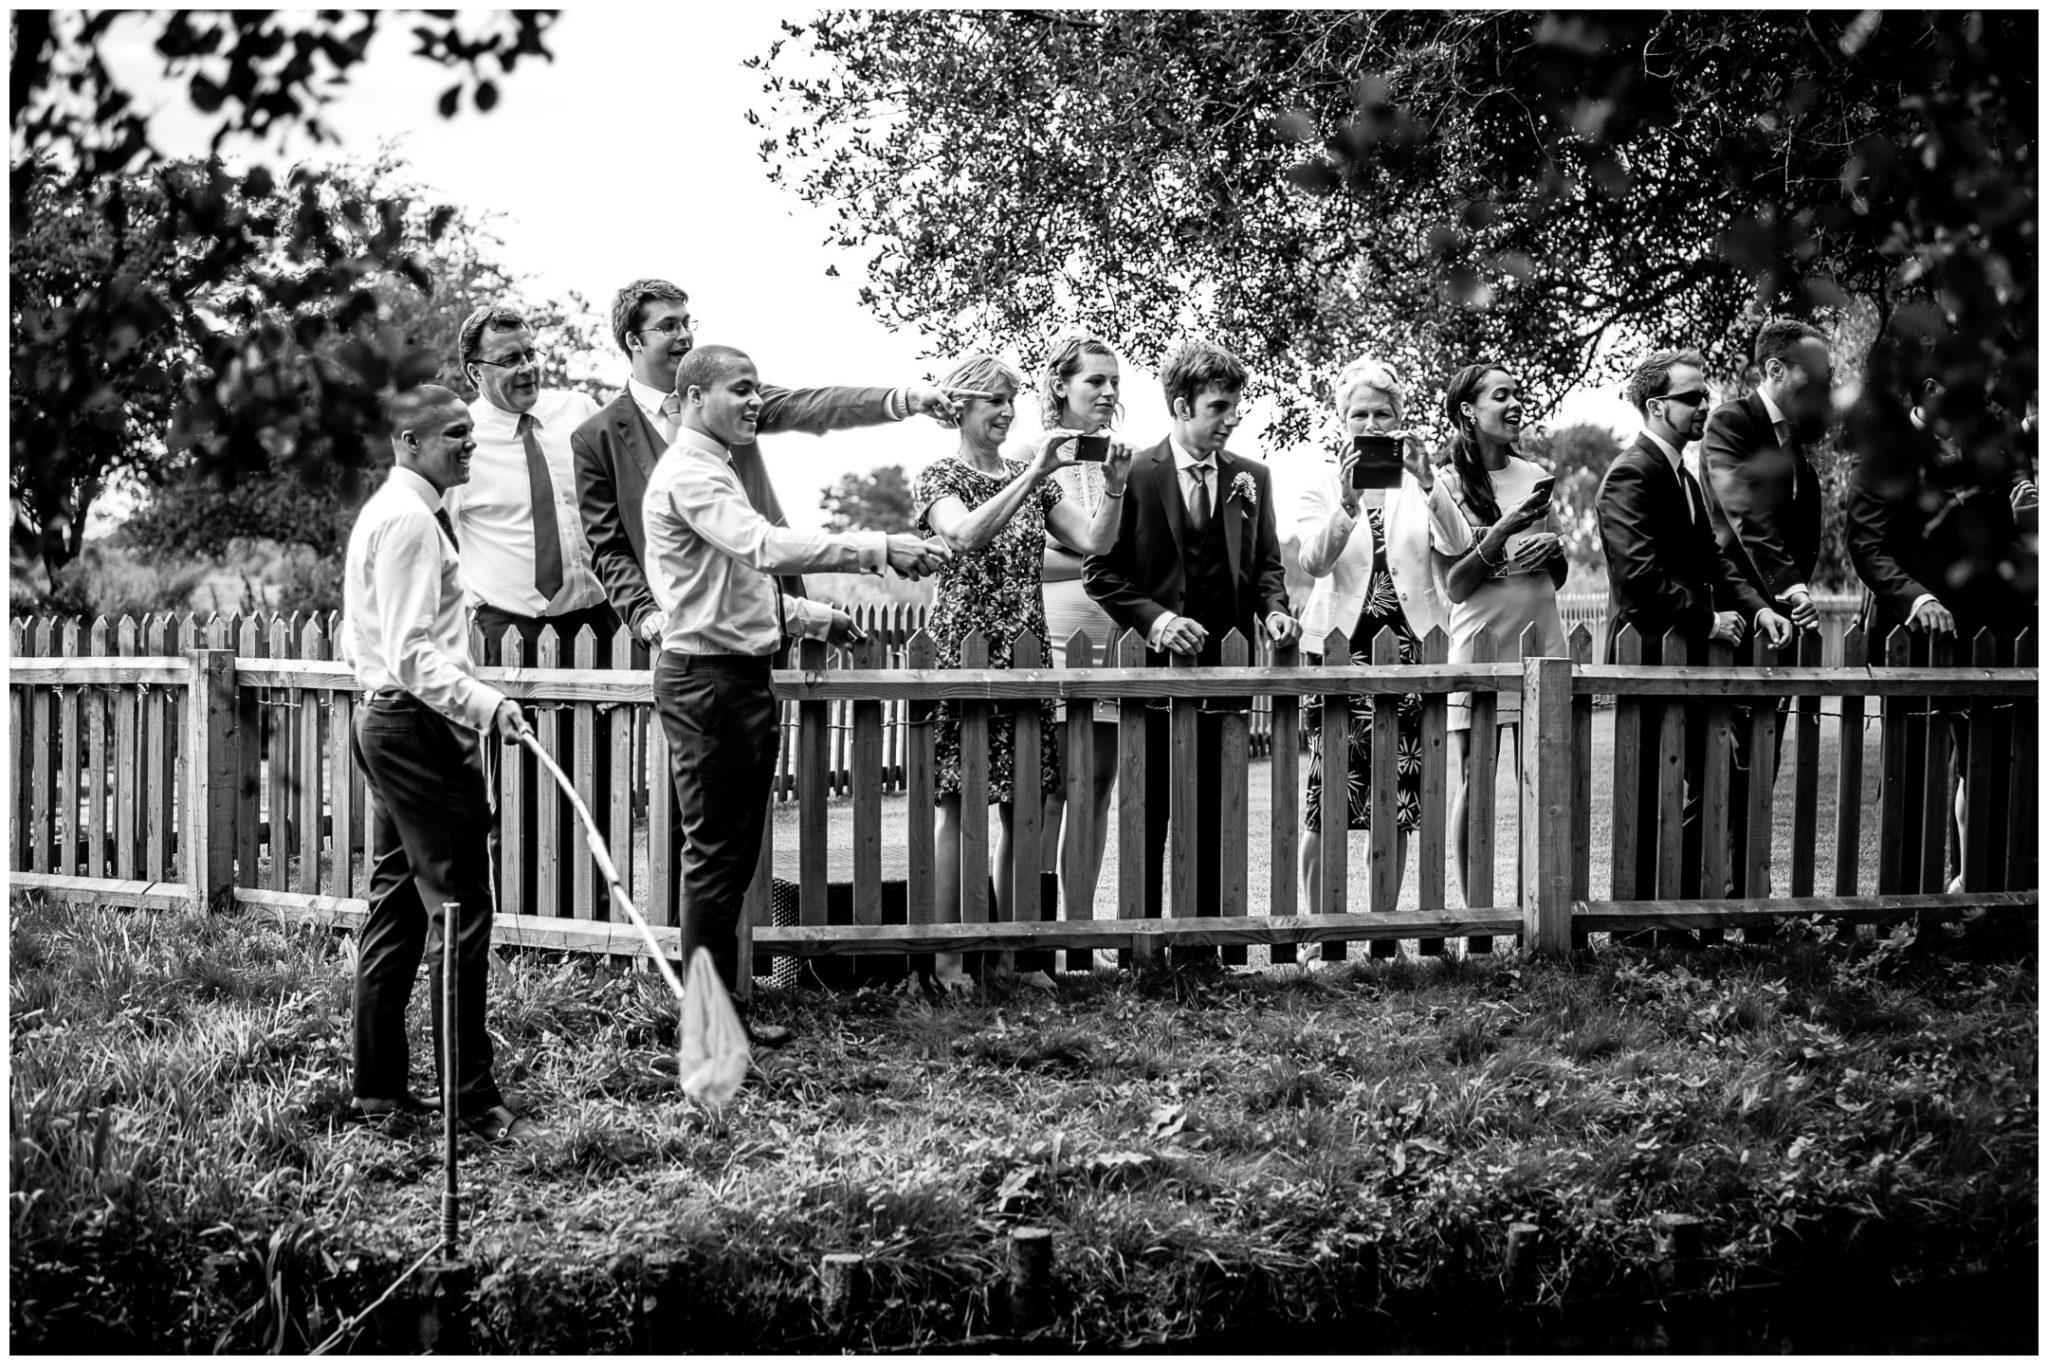 Sopley Mill Summer wedding guests watch duck race